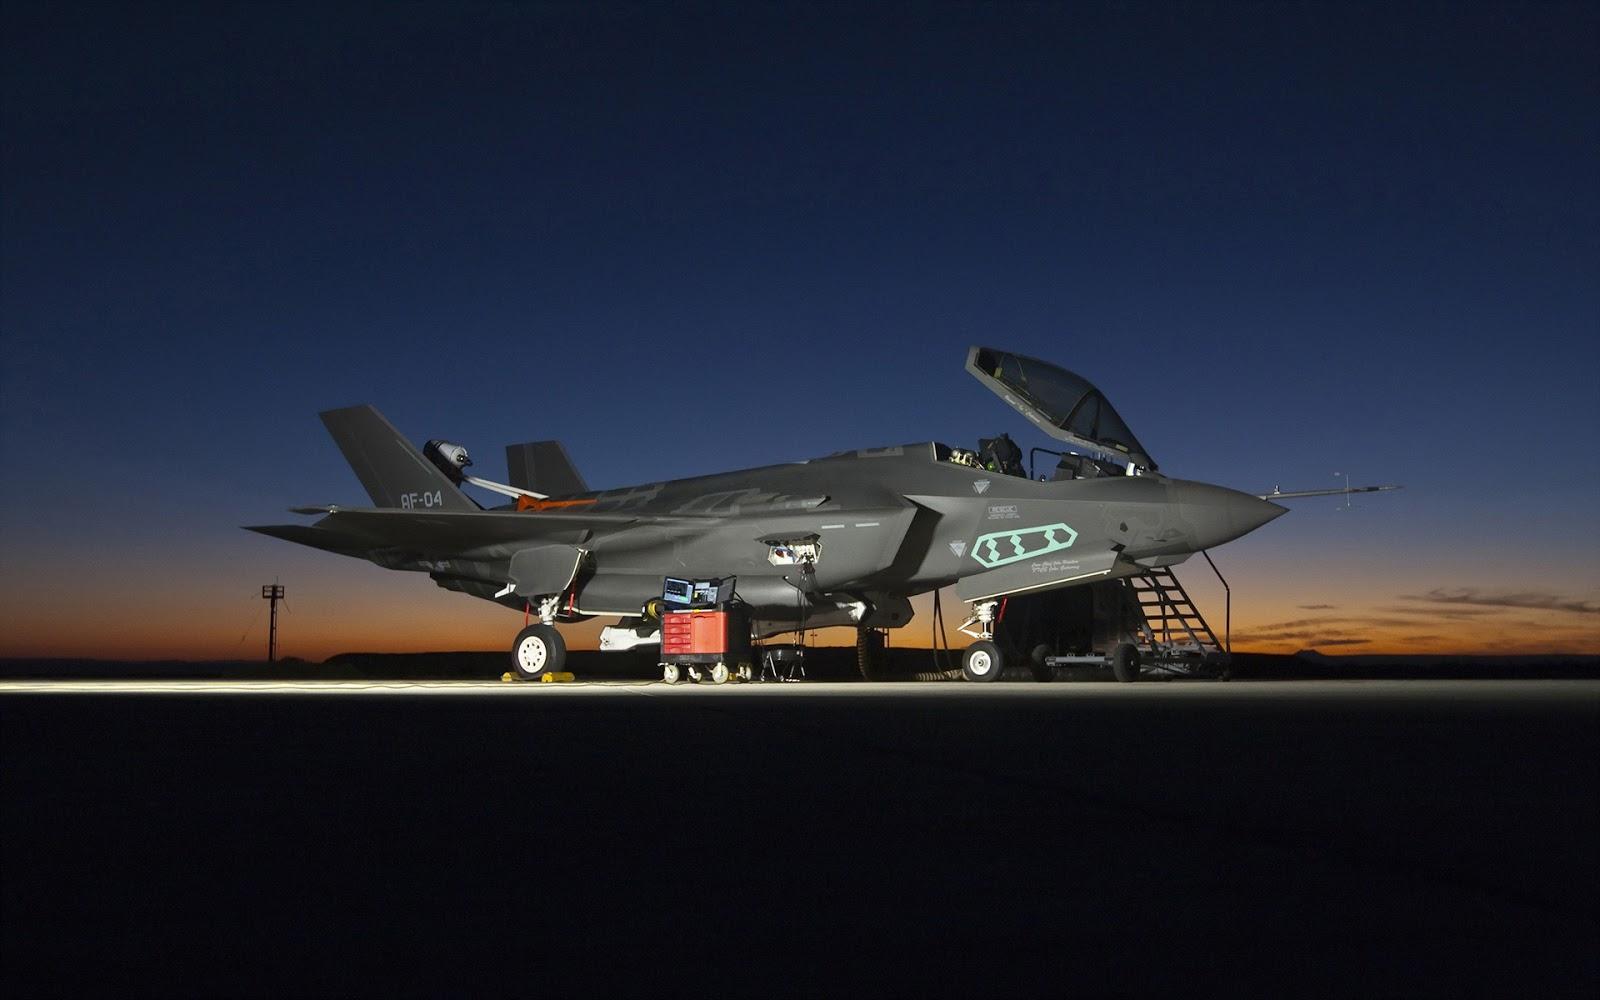 http://1.bp.blogspot.com/-KfECe9qub2o/UT2zBaa4vrI/AAAAAAAAOG8/5VHec0pdQ7Q/s1600/lockheed-martin-F-35-lightning-II-joint-strike-fighter-jsf-wallpaper.jpg